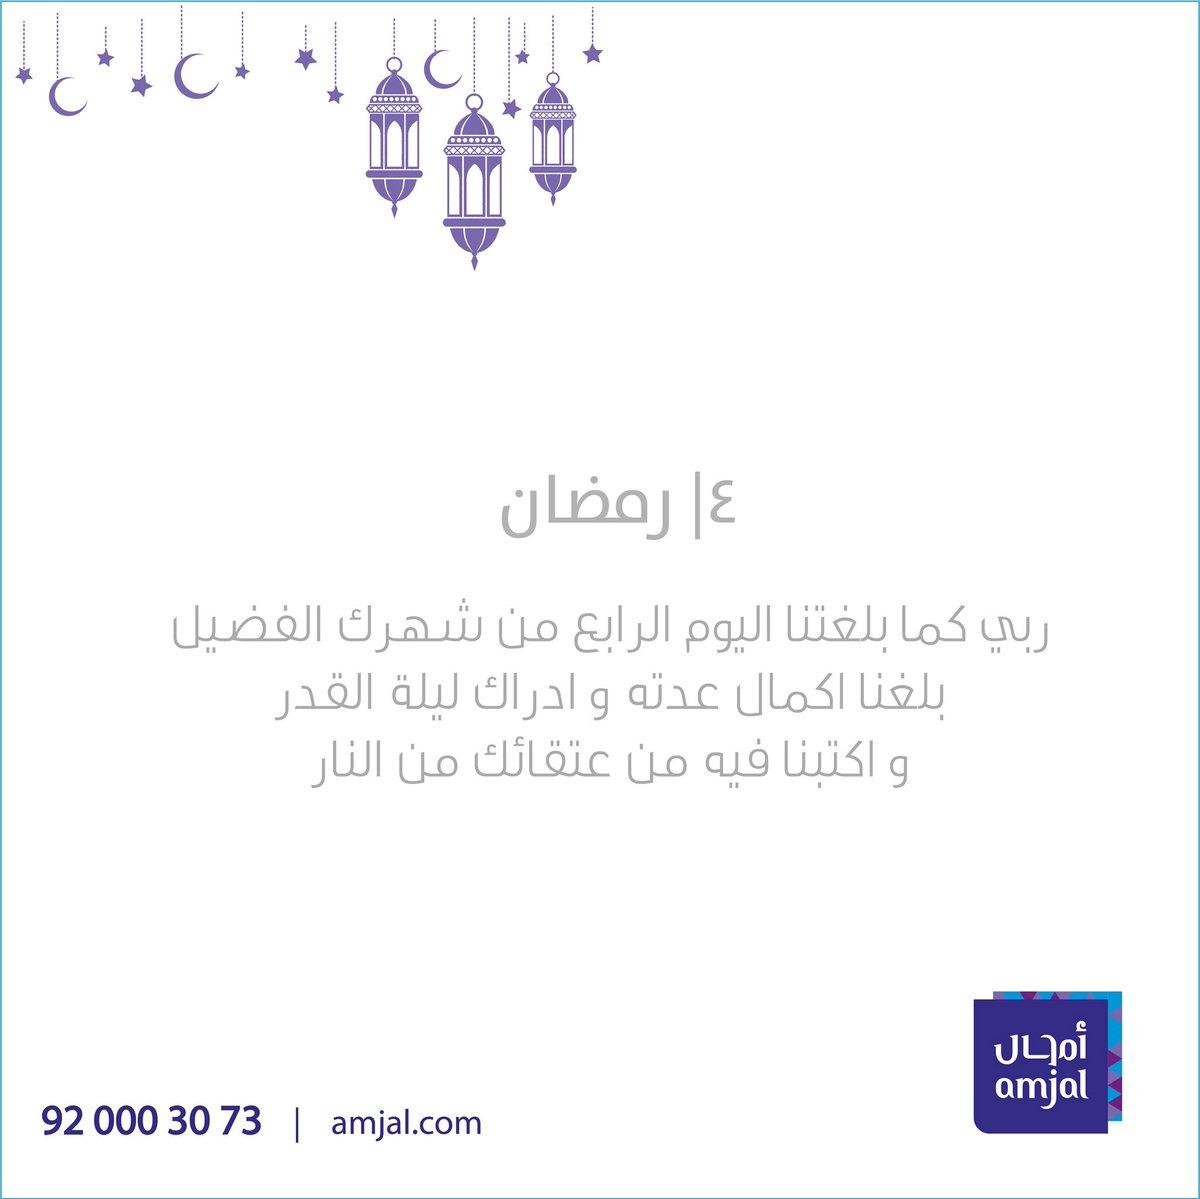 #دعاء_رمضان https://t.co/zkUlPcAfe7